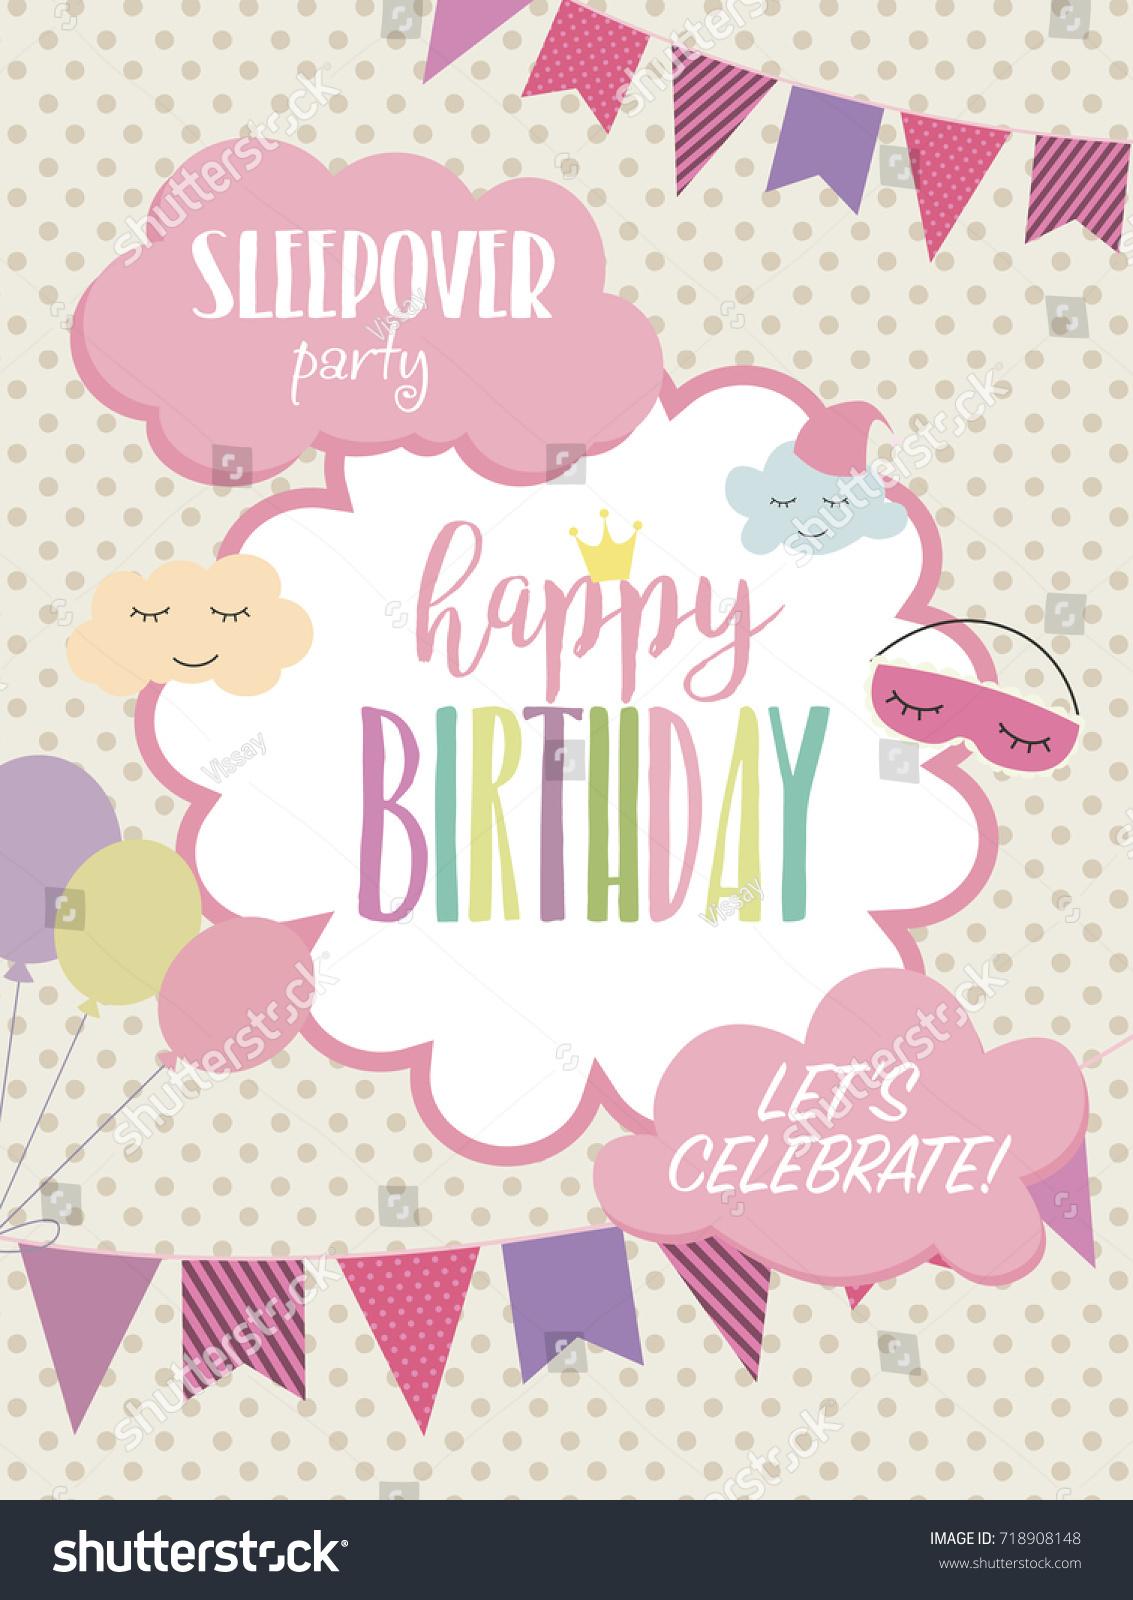 Slumber party invitation card. Birthday invitation card. Vector ...